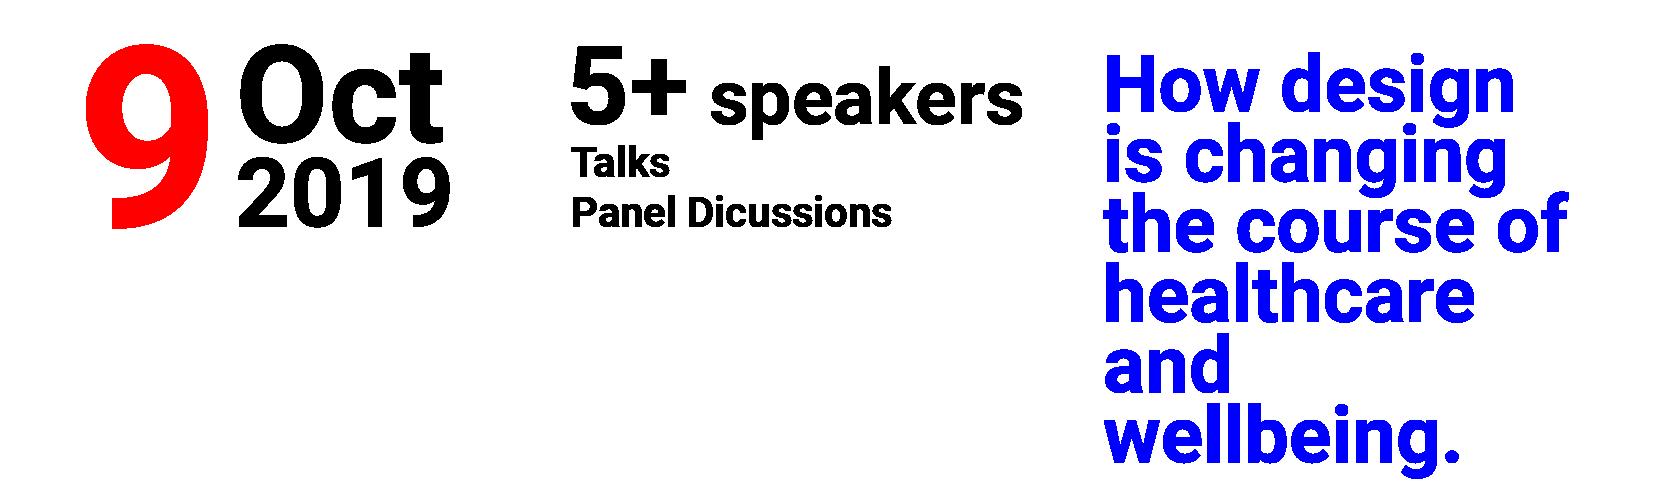 image 2-05.png